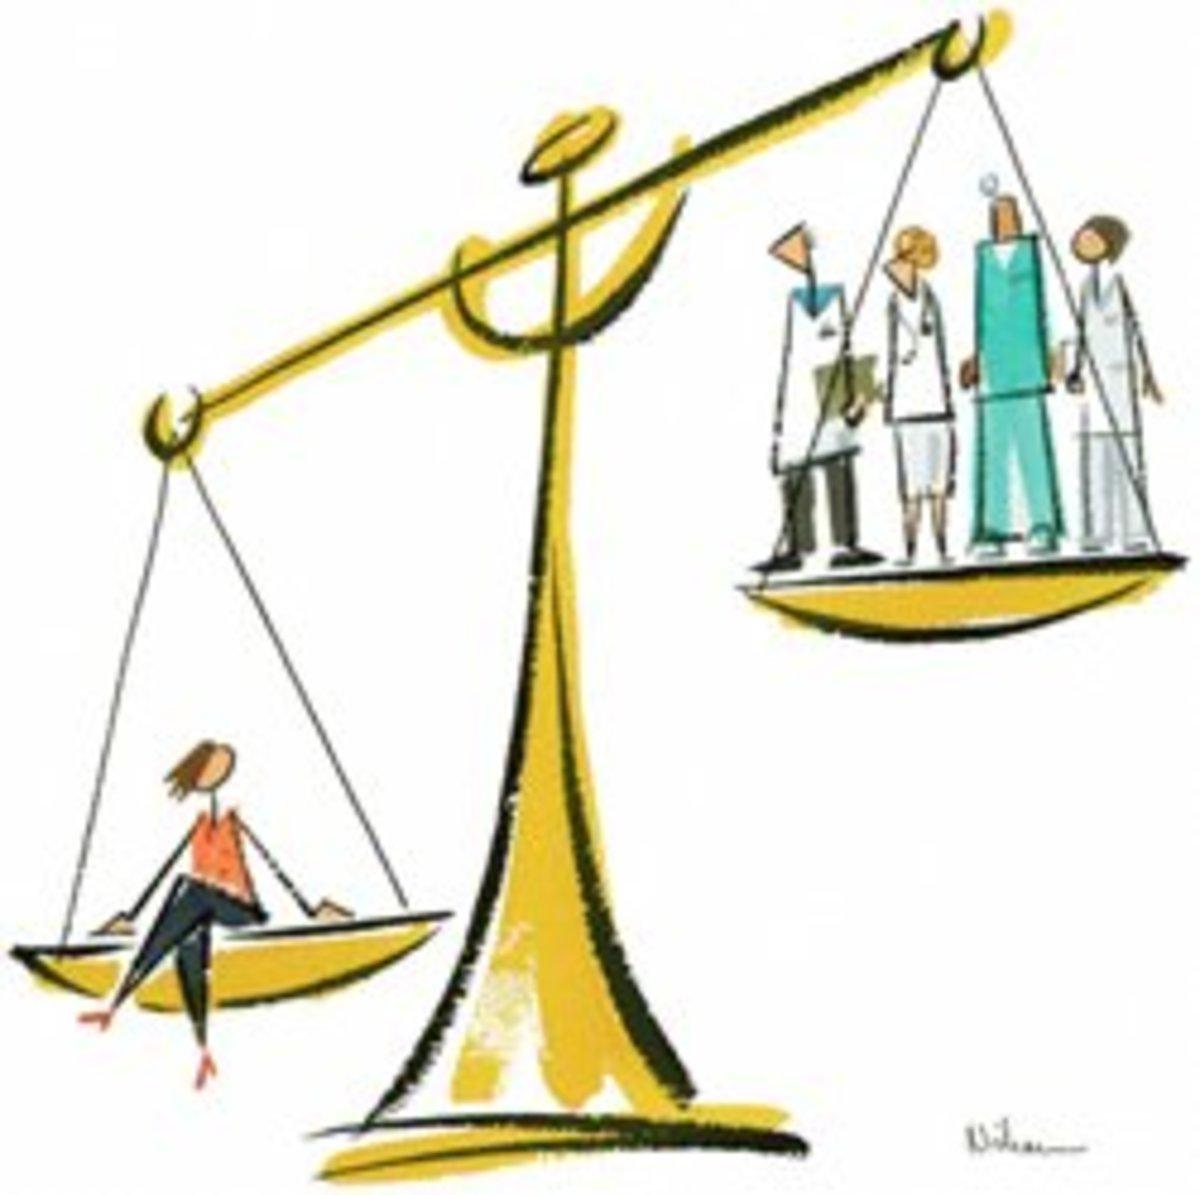 minority-vs-dominant-groups